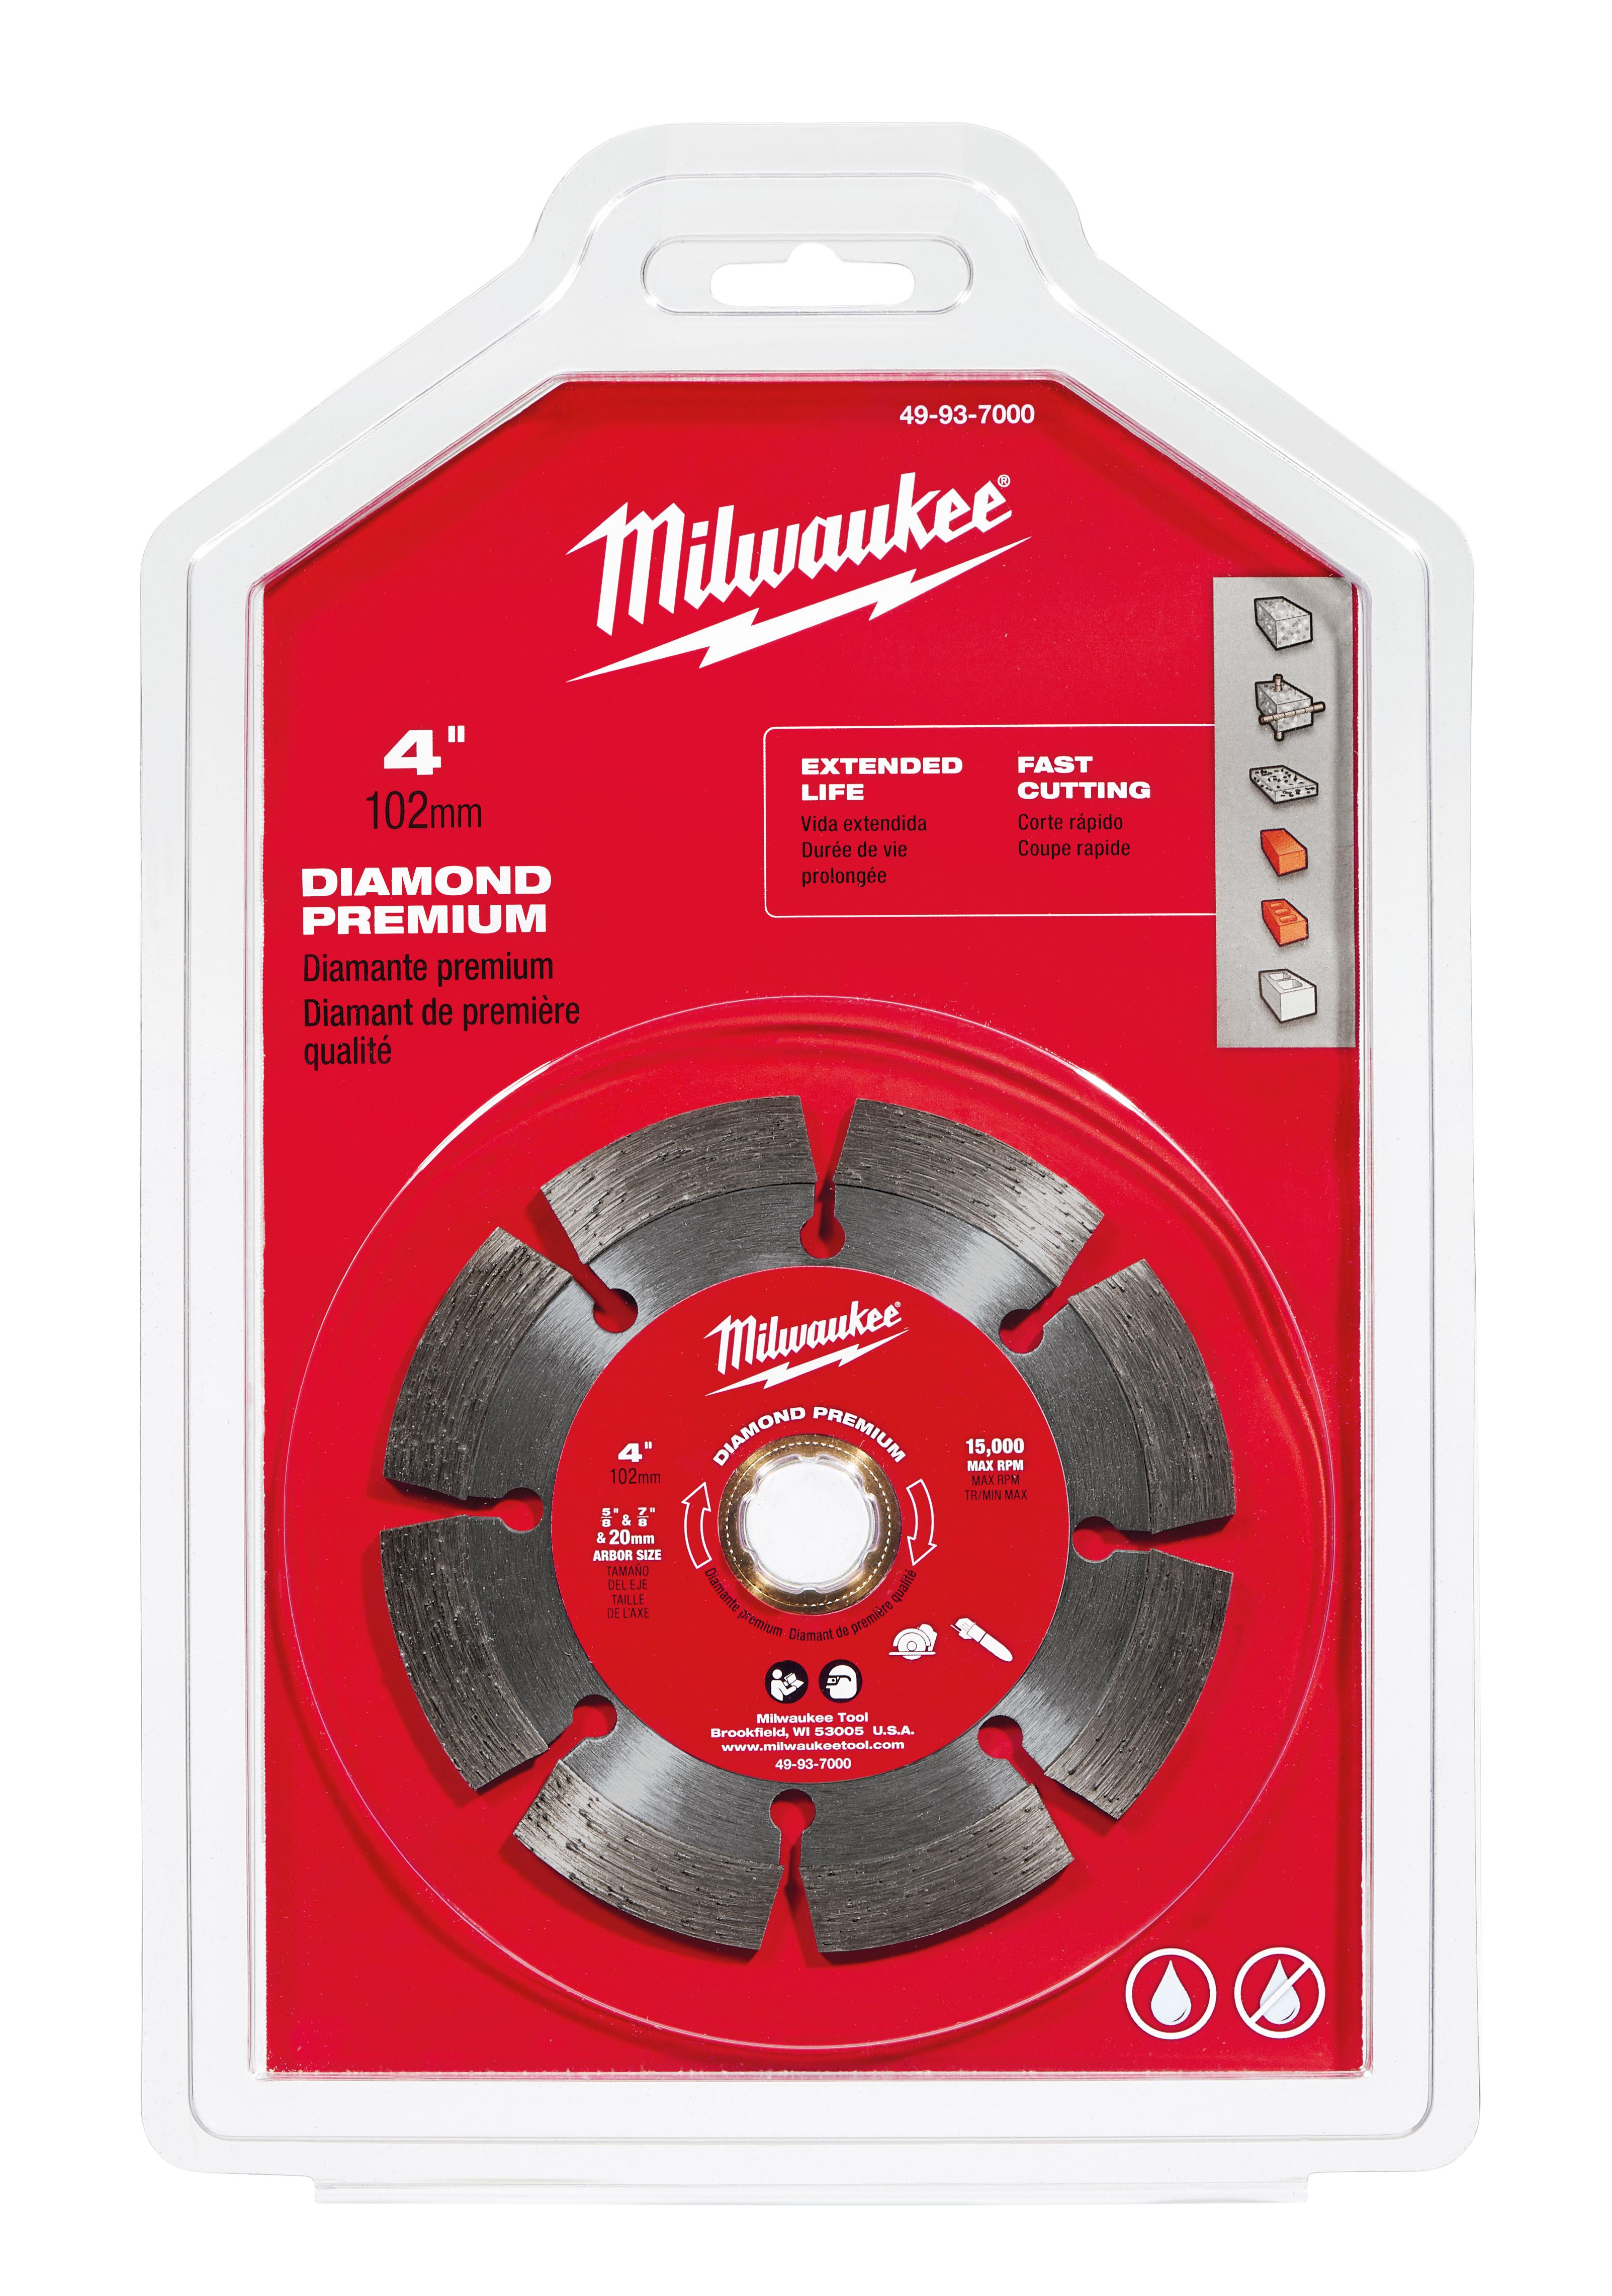 Milwaukee® 49-93-7000 Premium Segmented Circular Diamond Saw Blade, 4 in Dia Blade, 7/8 in, 20 mm, 5/8 in Arbor/Shank, Dry/Wet Cutting